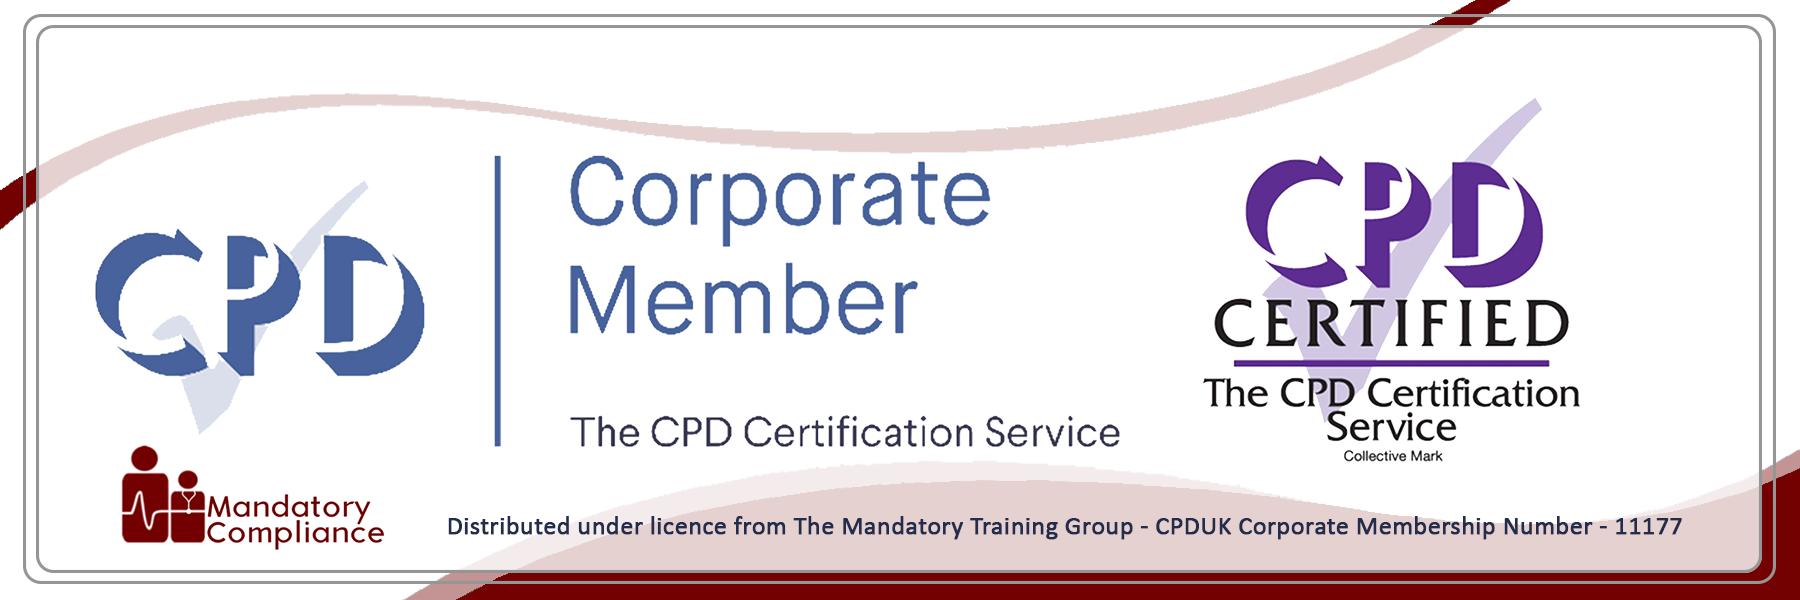 Developing Corporate Behaviour - Online Training Course - CPDUK Accredited - Mandatory Compliance UK -